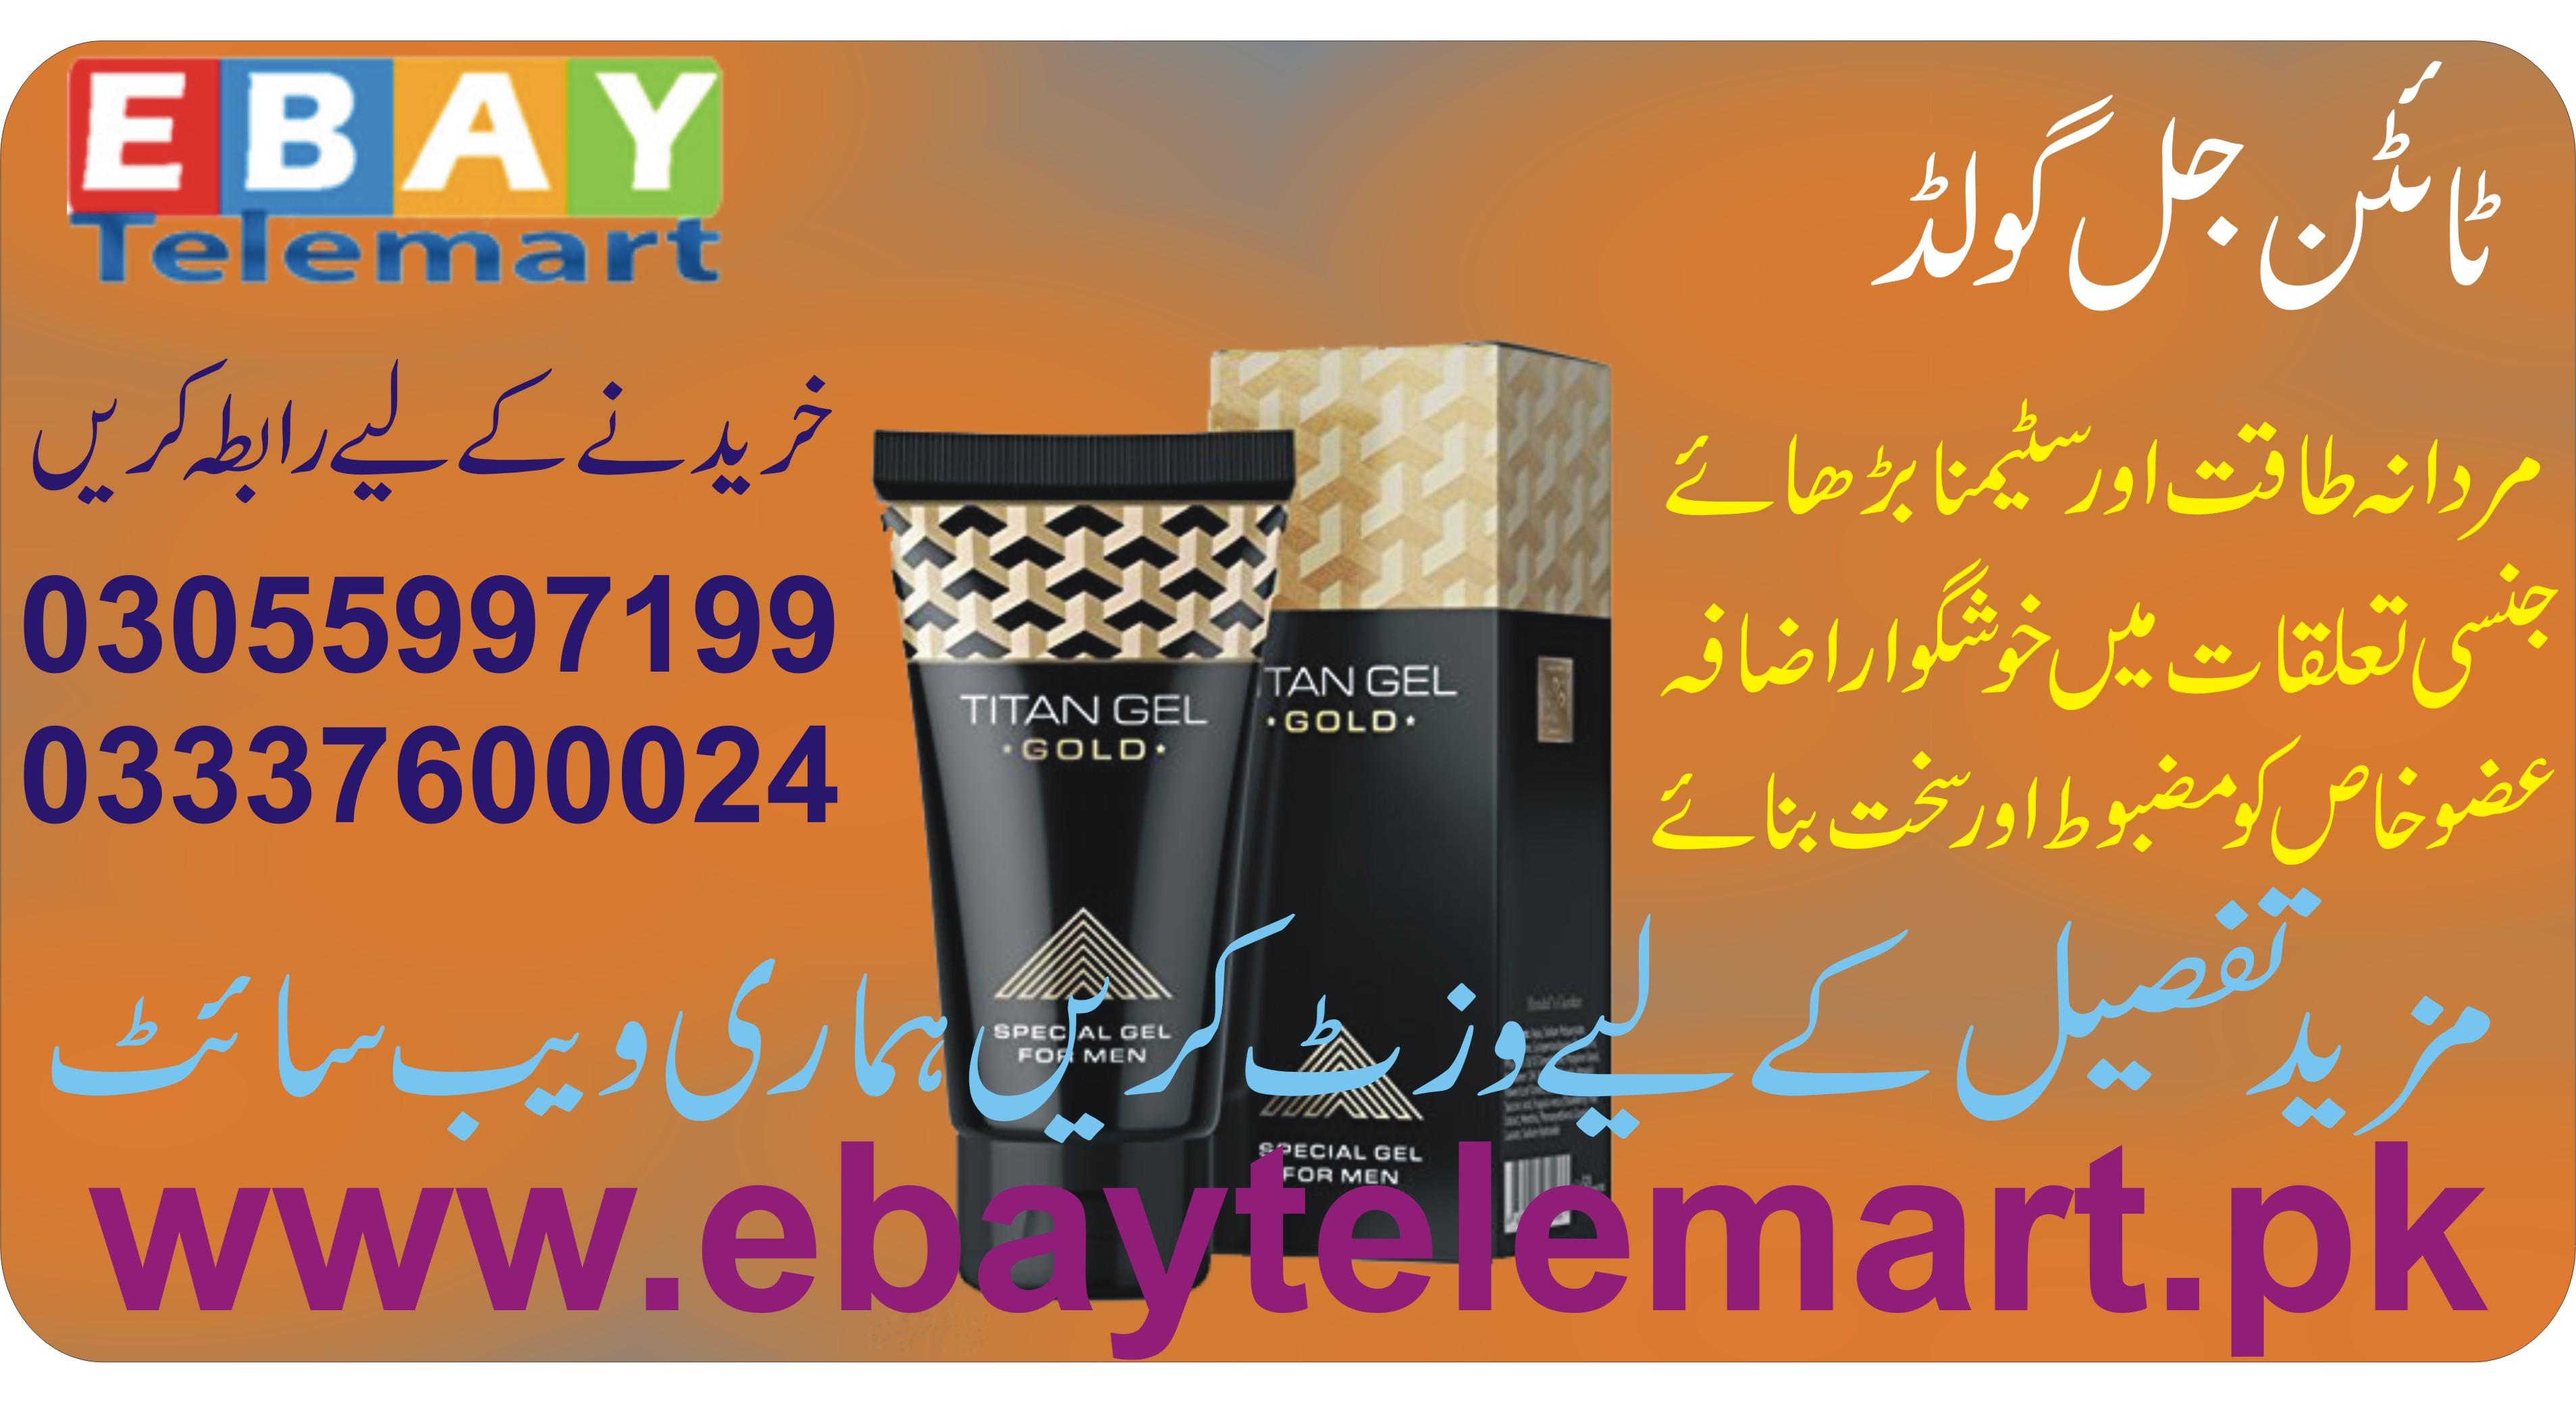 Titan Gel Gold Price in Pakistan 03055997199